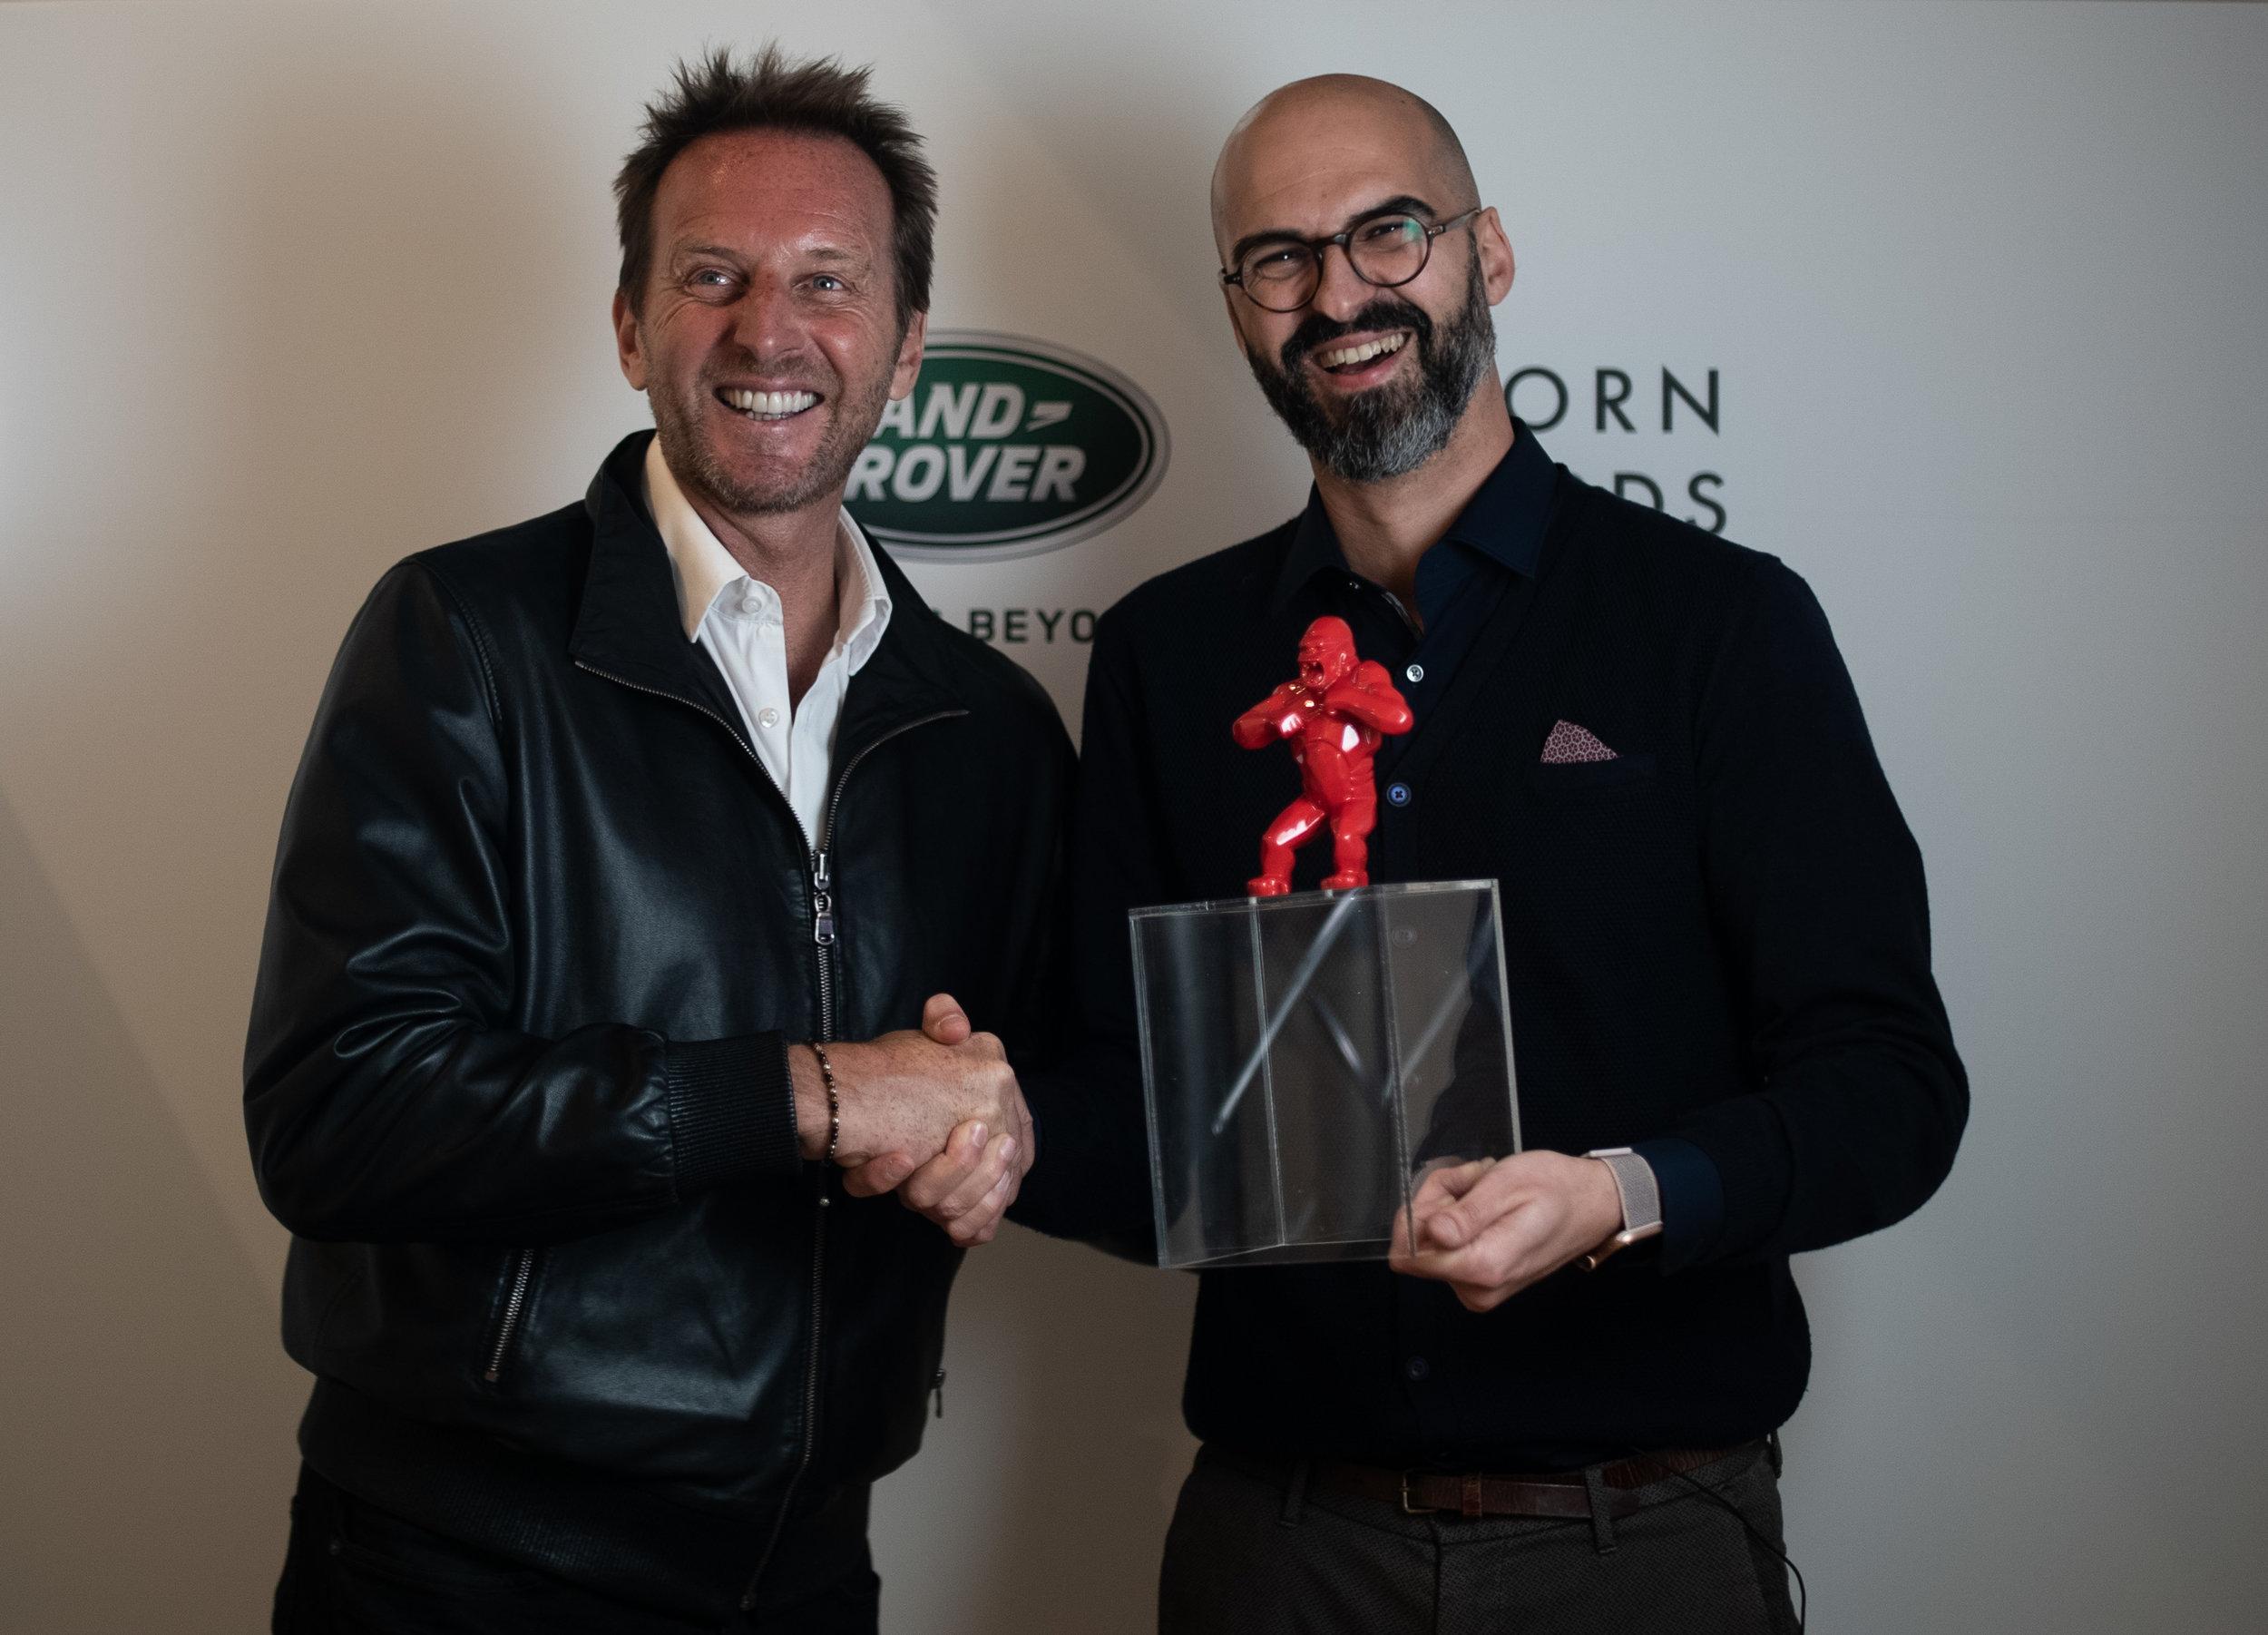 BORN Awards founder  Jean-Christophe Chopin & Xavier Mora  creative director at Livingthings & BAG Disseny STUDIO